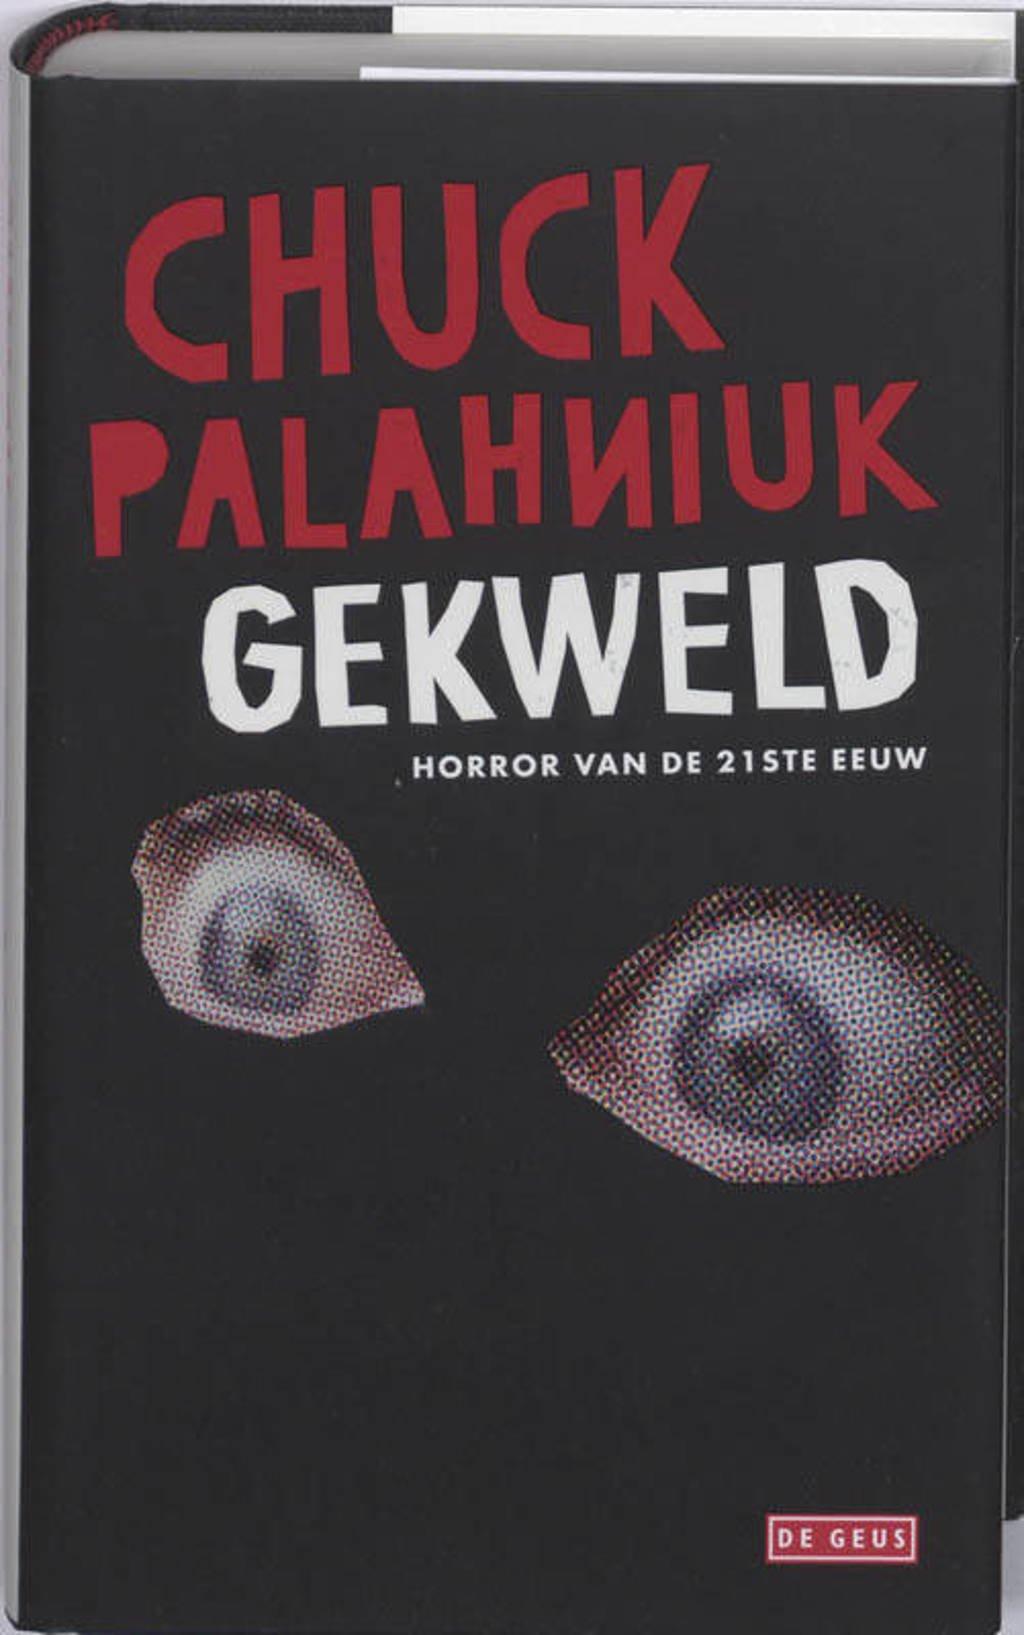 Gekweld - Chuck Palahniuk